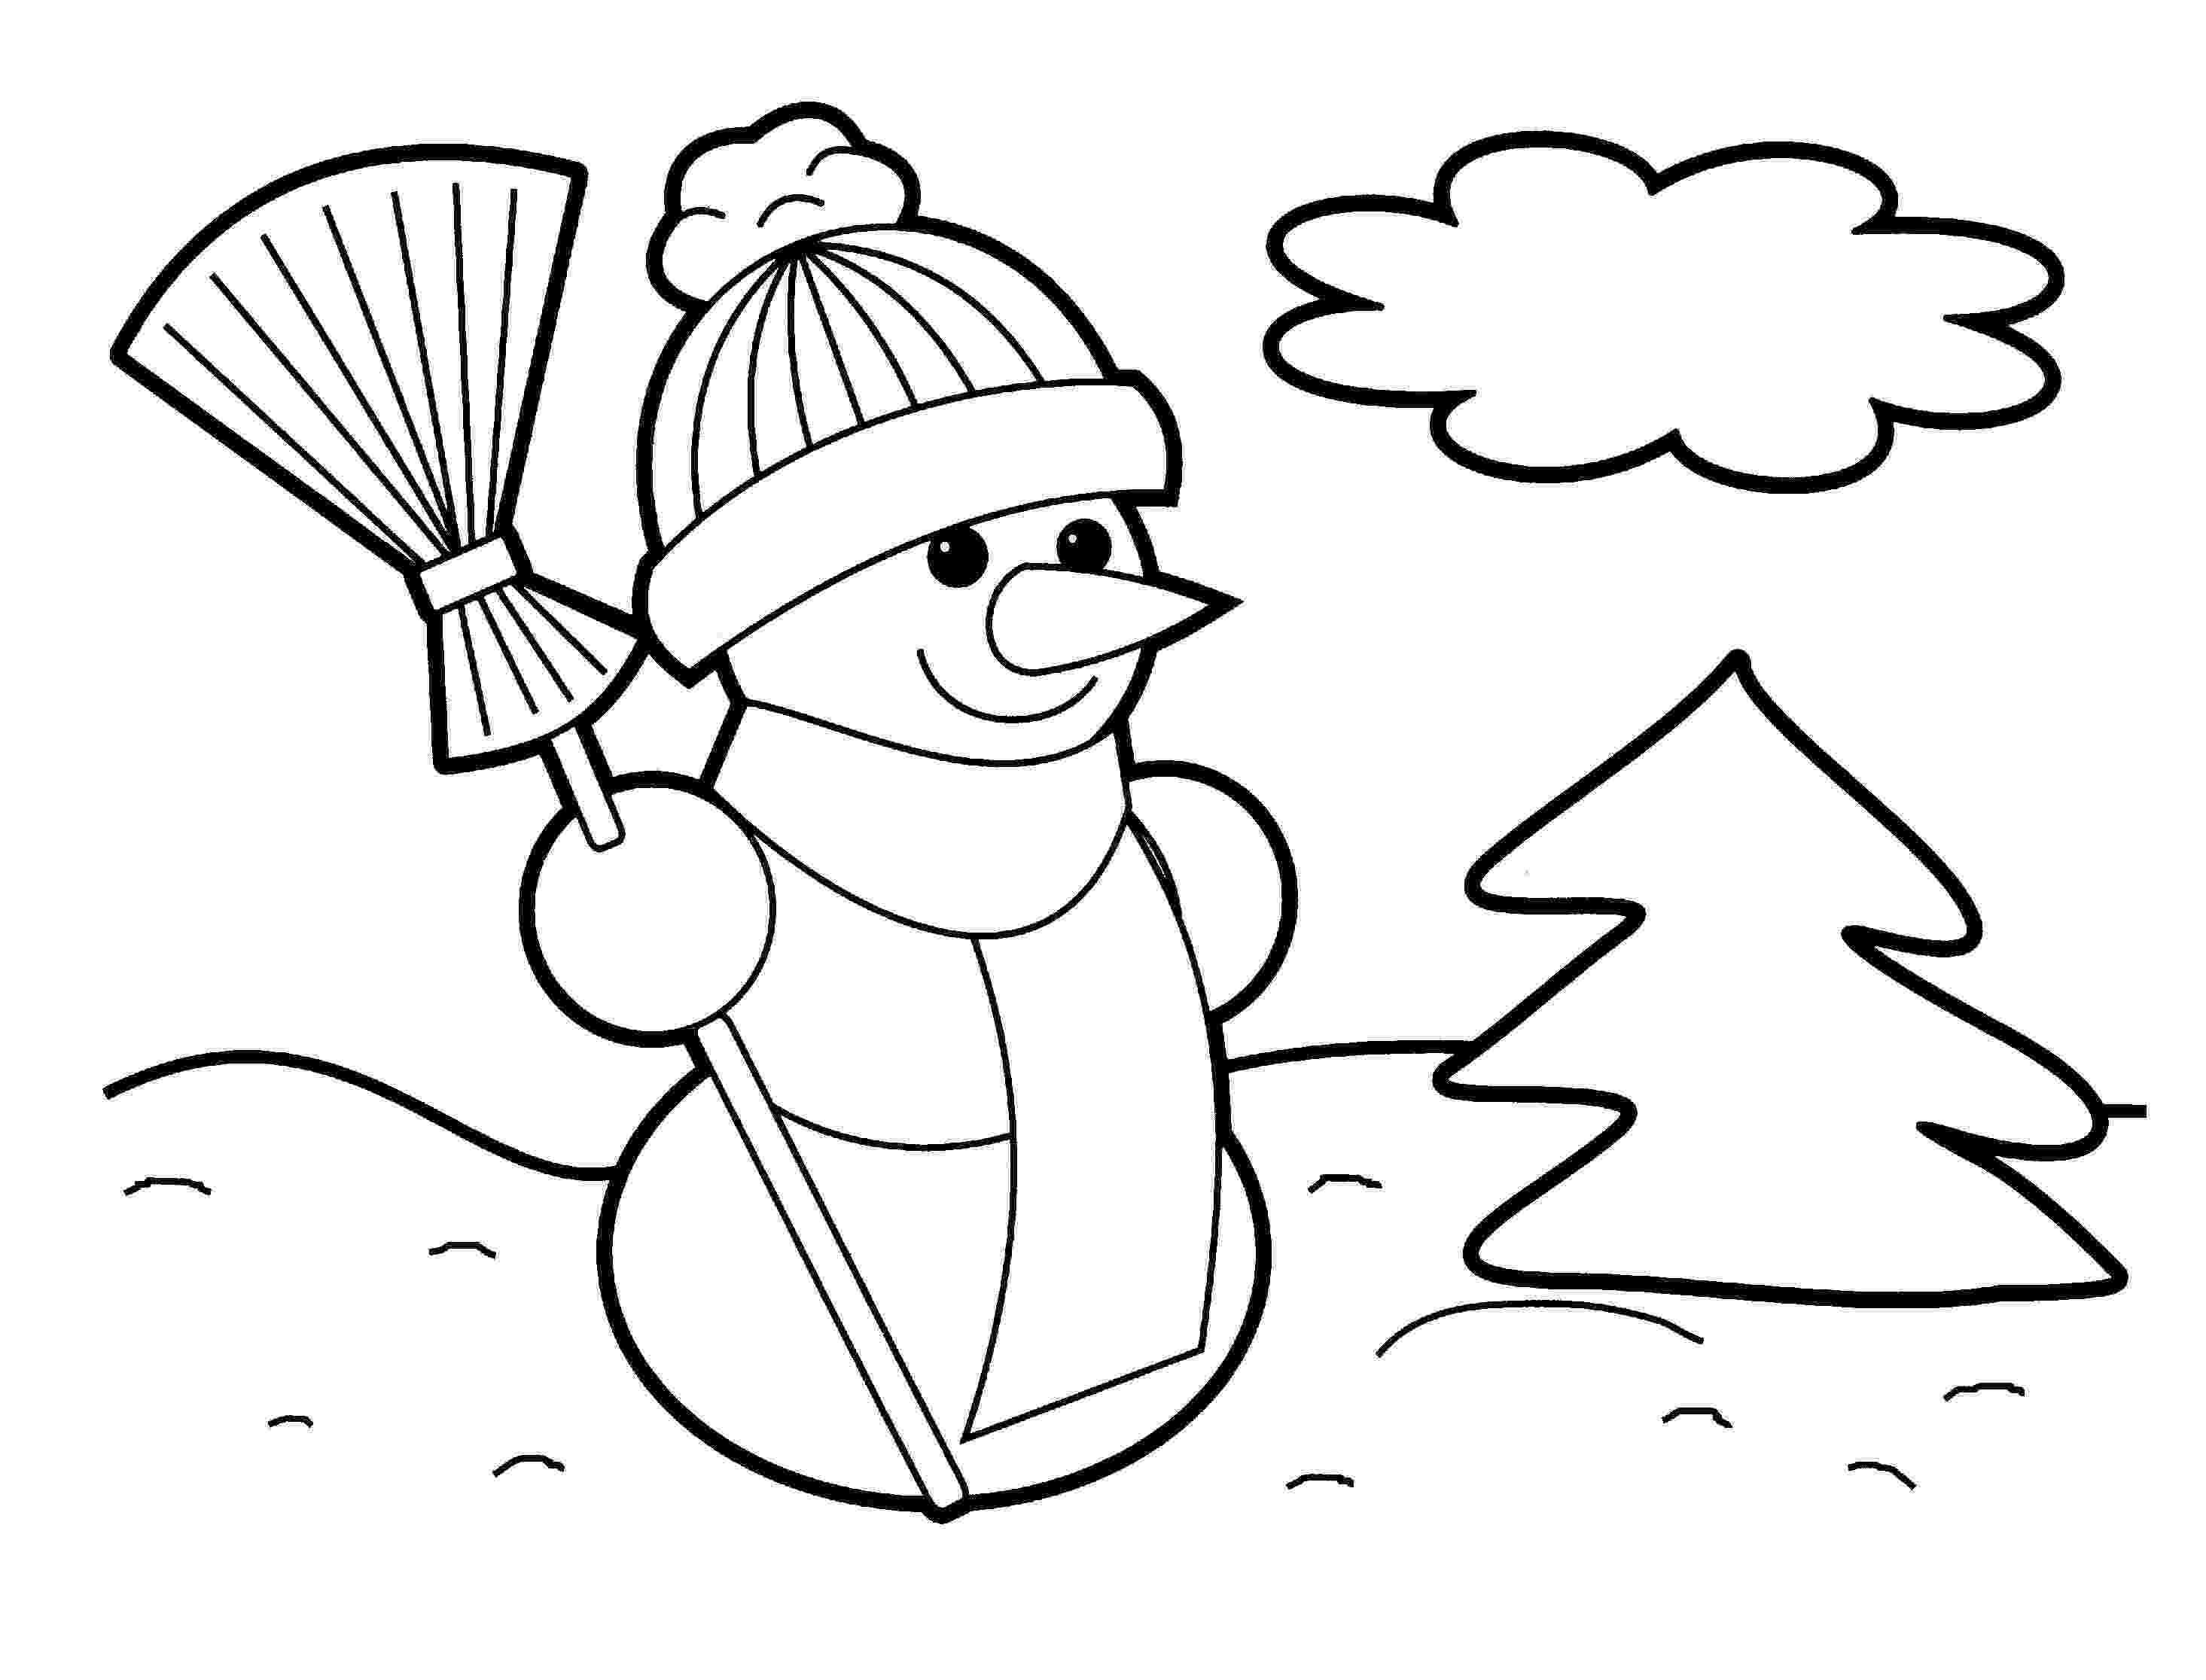 christmas coloring sheets free christmas coloring pages free wallpapers9 free coloring sheets christmas